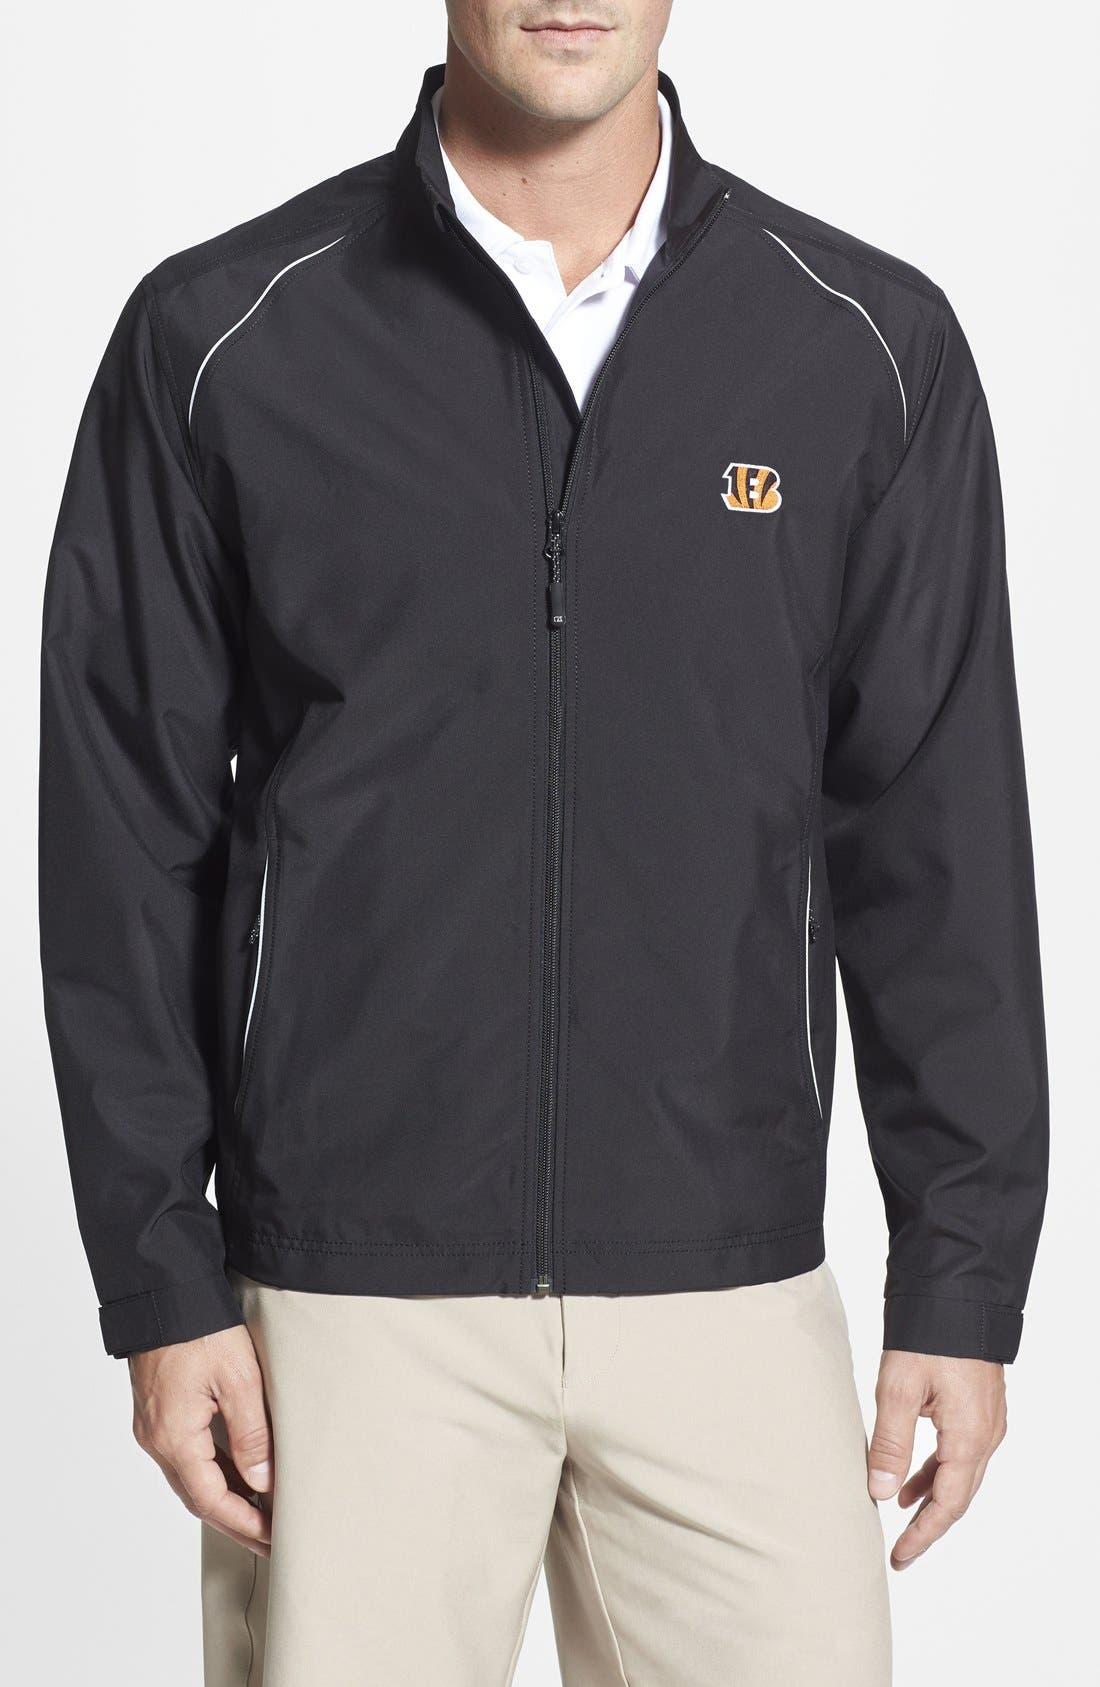 Cincinnati Bengals - Beacon WeatherTec Wind & Water Resistant Jacket,                             Main thumbnail 1, color,                             Black